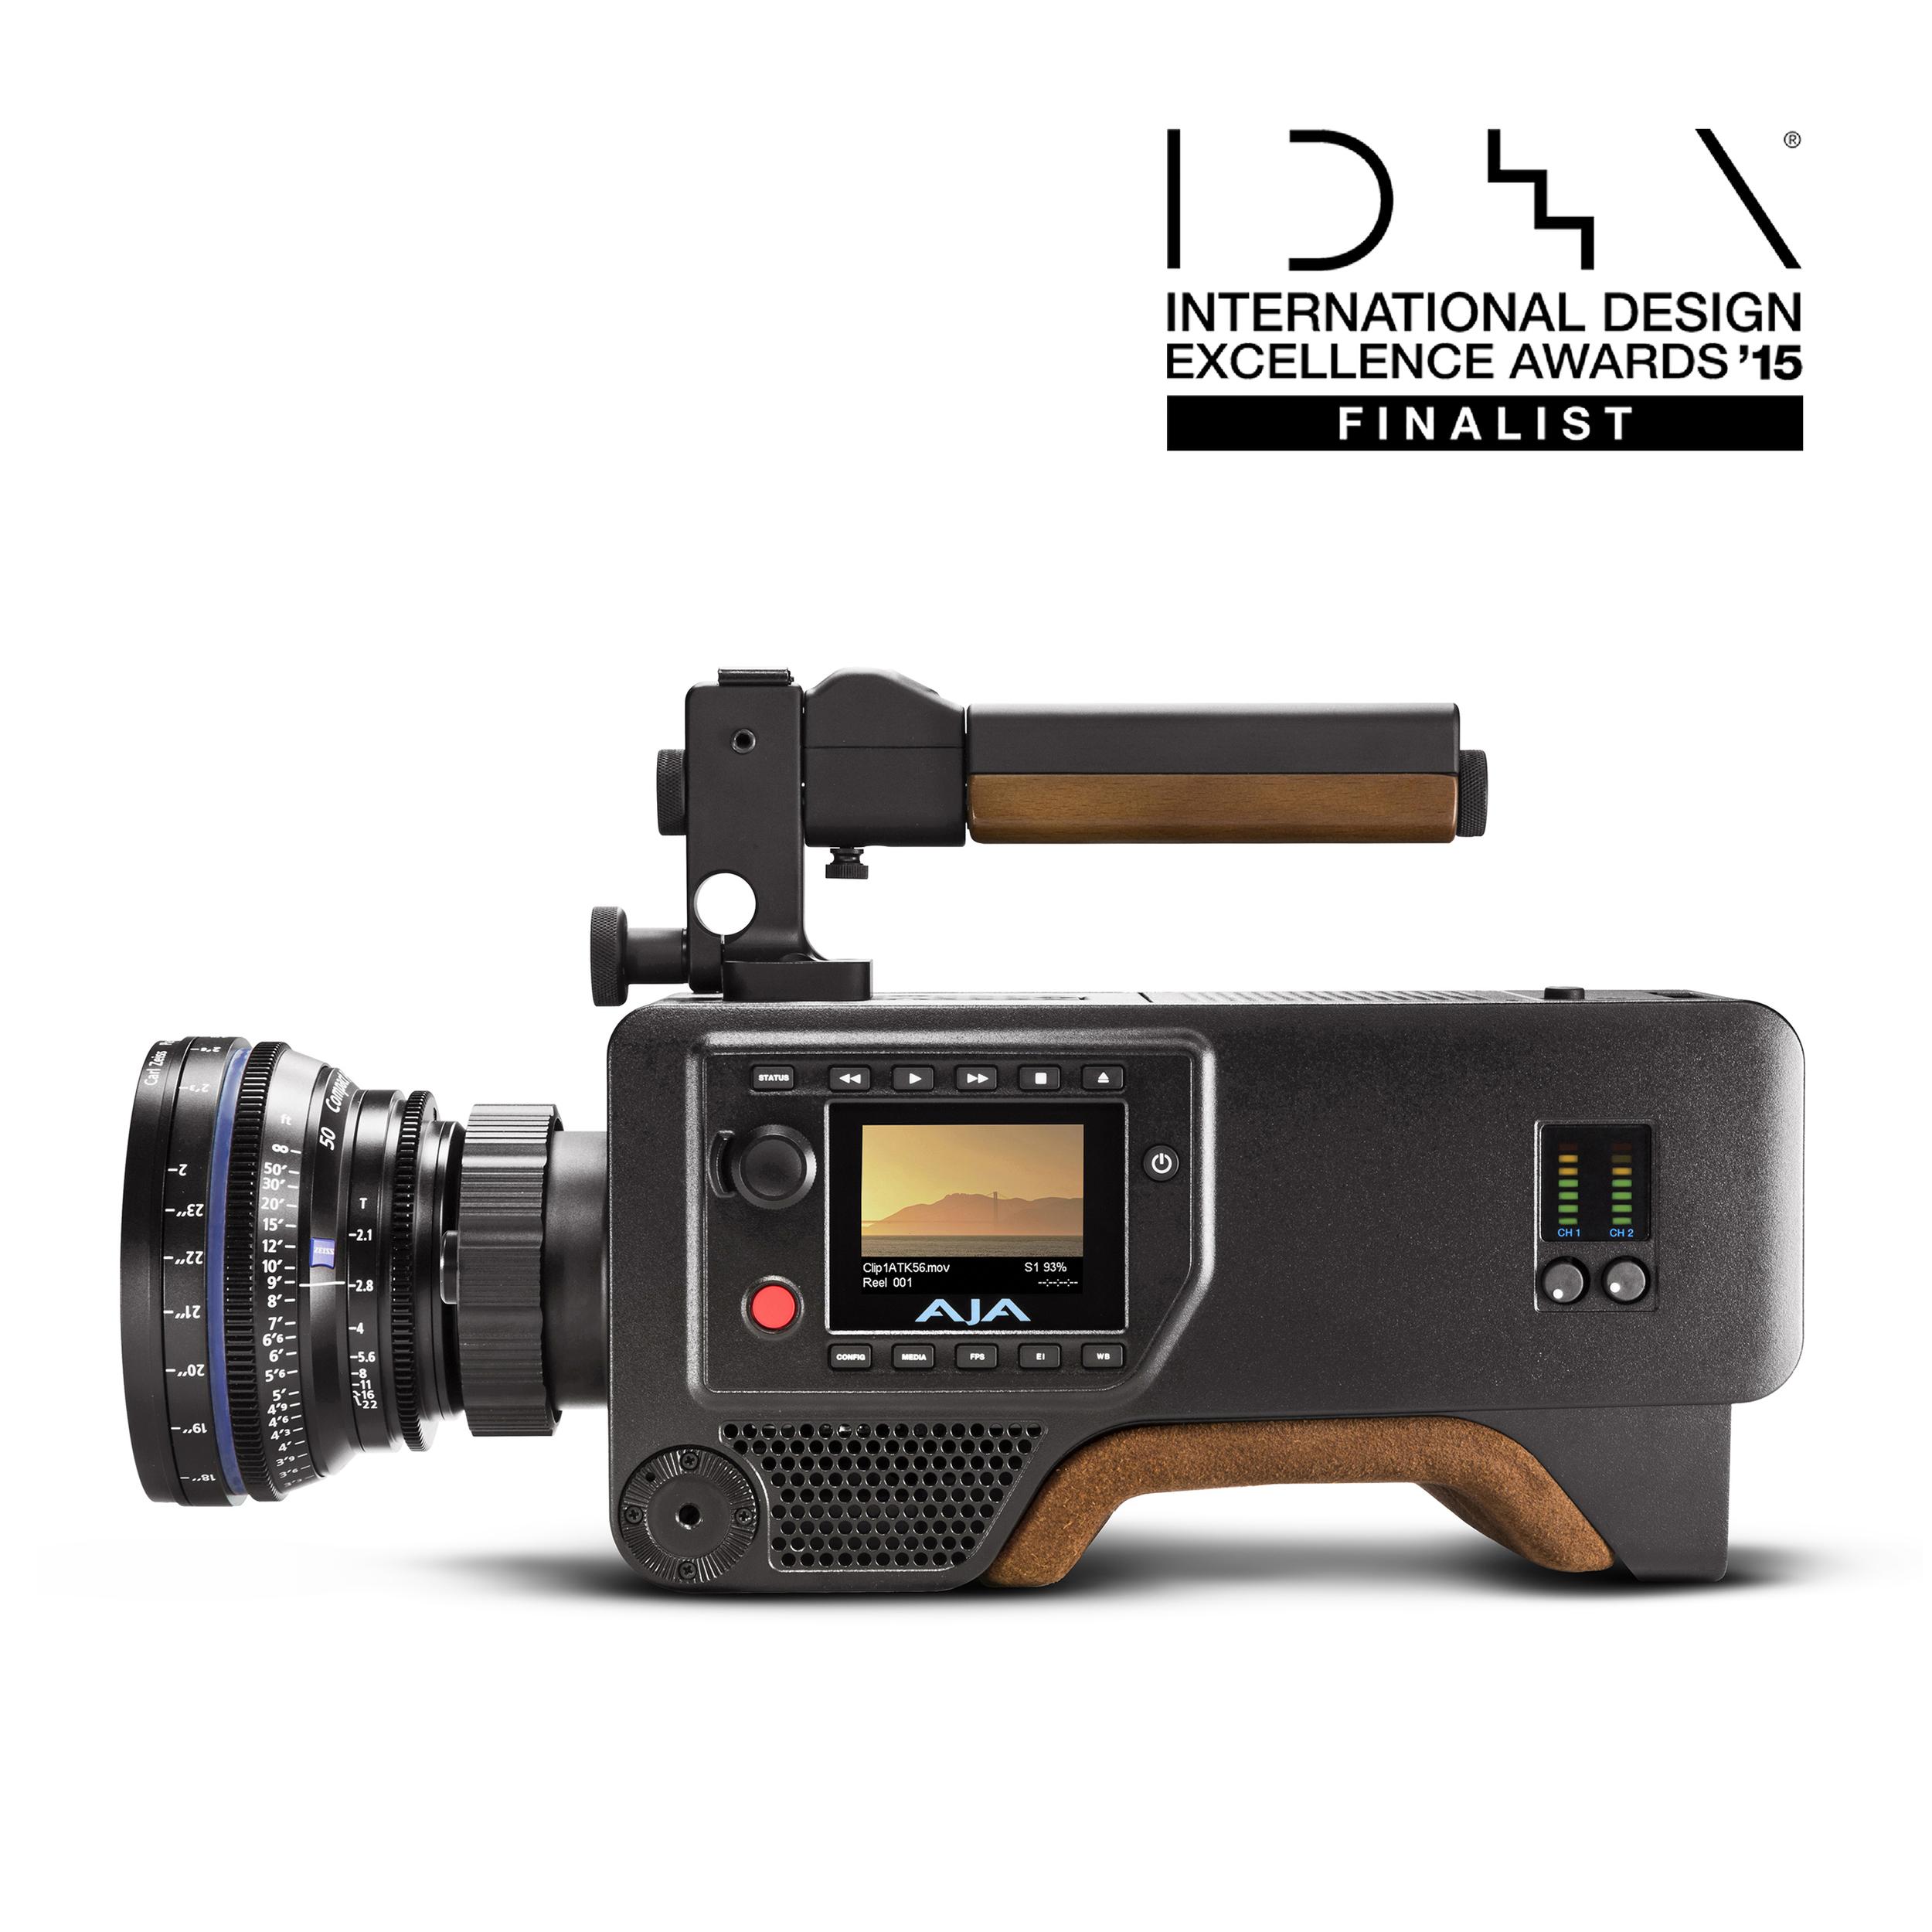 AJA Cion 4K Production Camera   International Design Excellence Awards (IDEA) – Featured Finalist